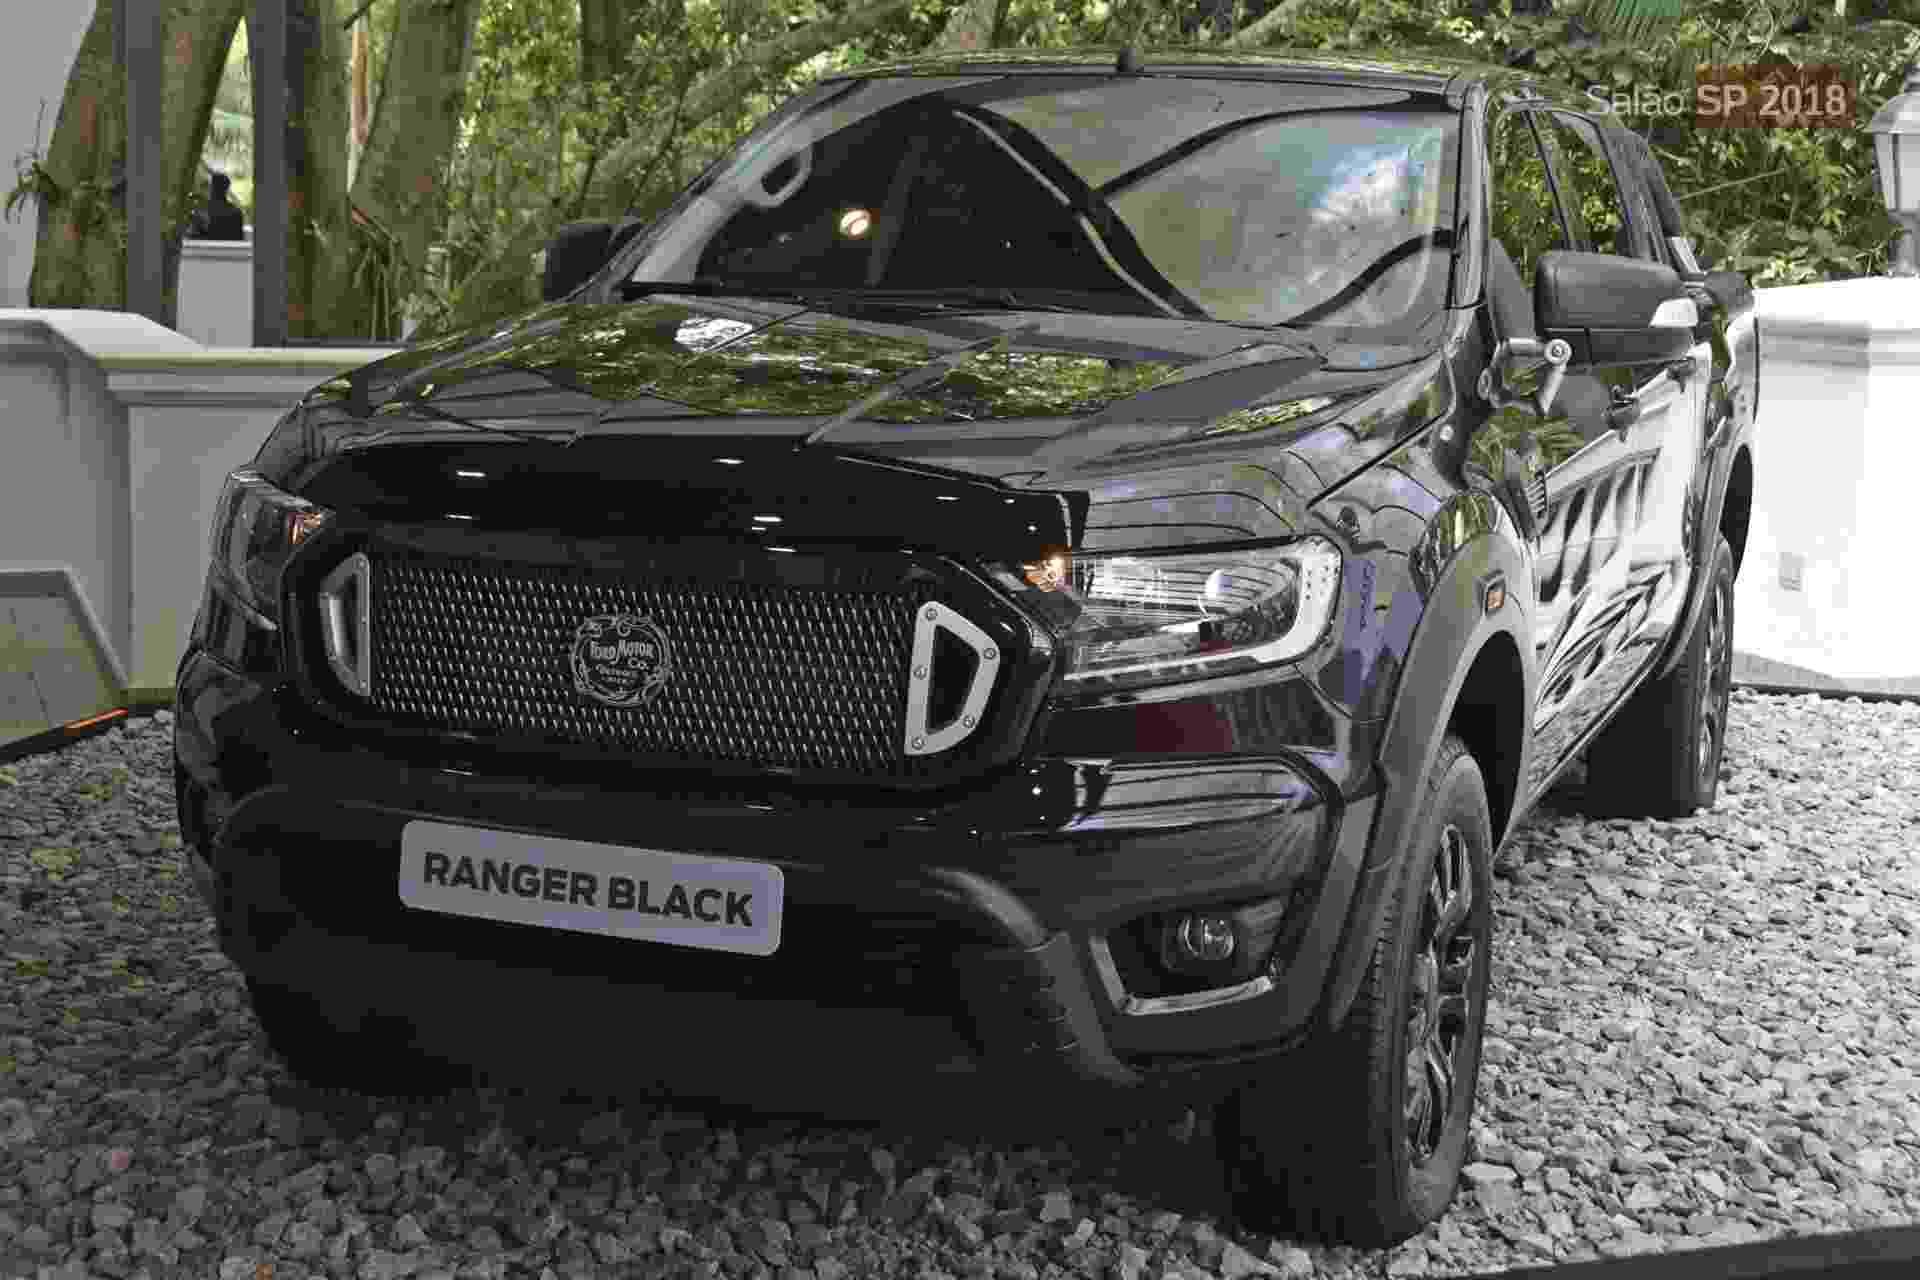 Ford Ranger Black Concept - Murilo Góes/UOL